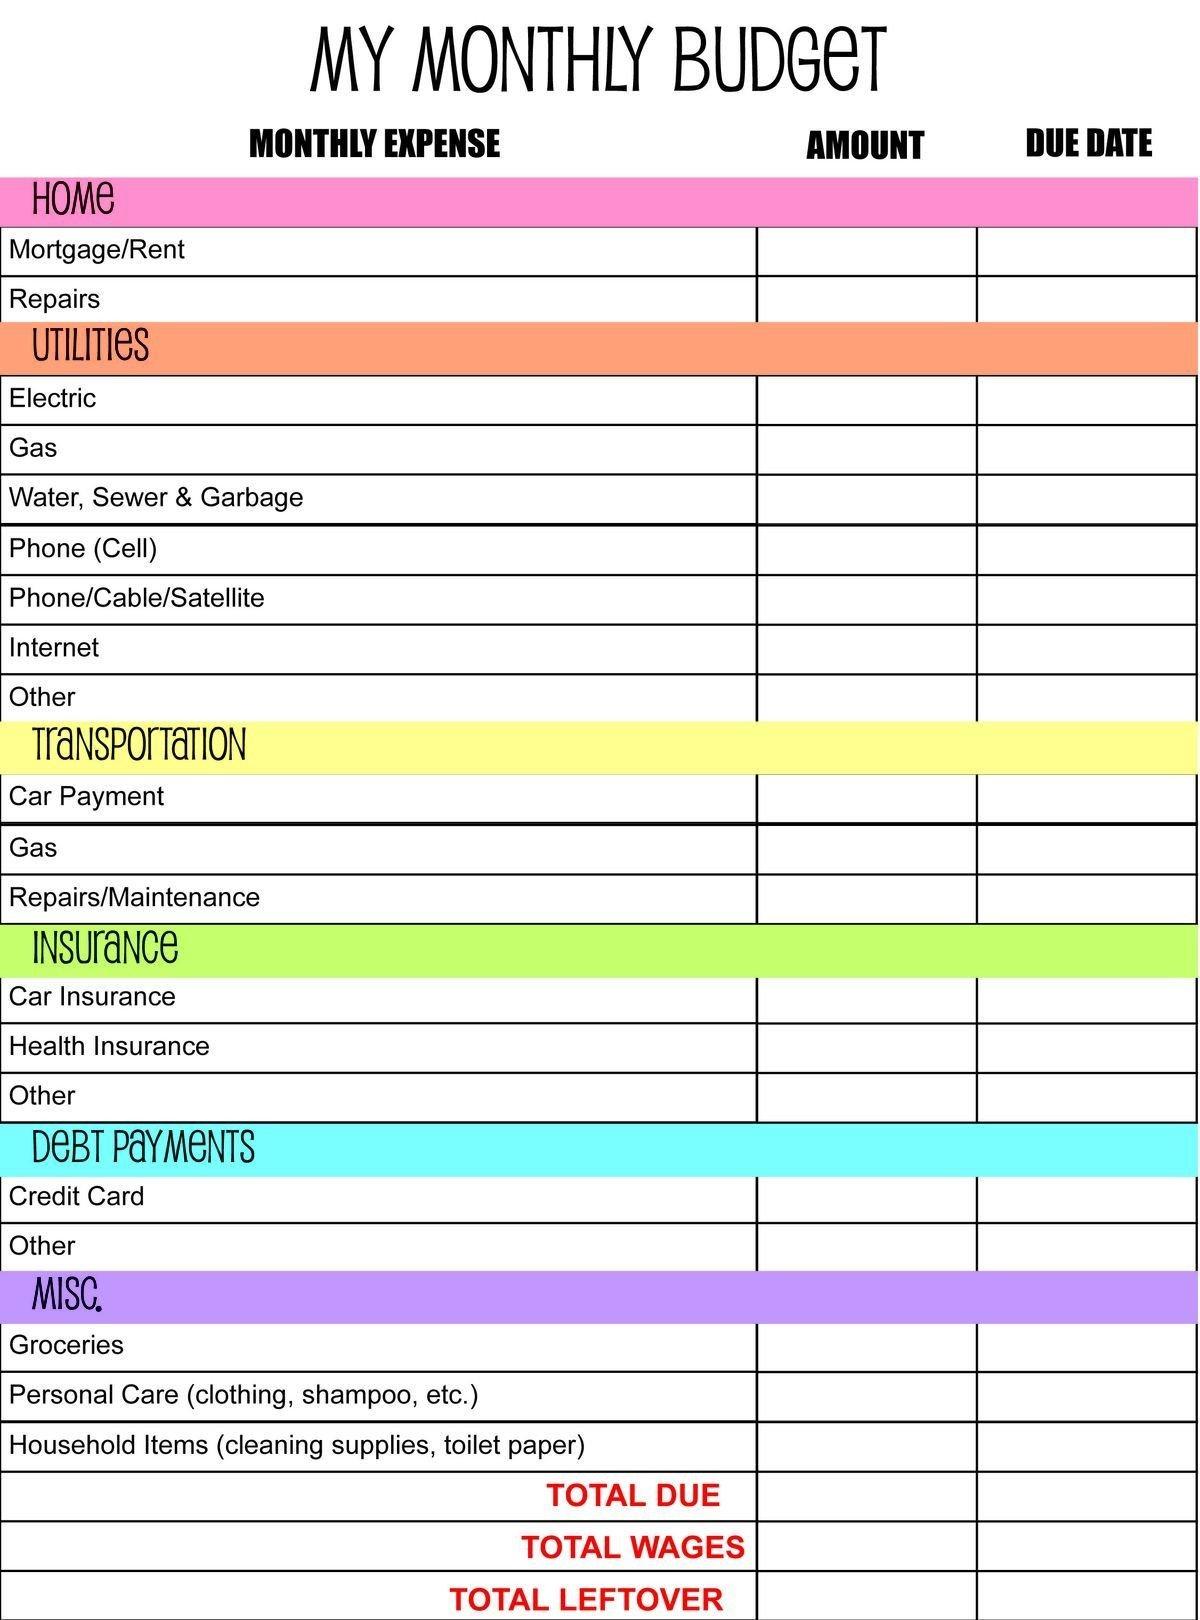 Financial Plannin Turbotap Financial Planning Worksheet Big Math With Turbotap Financial Planning Worksheet